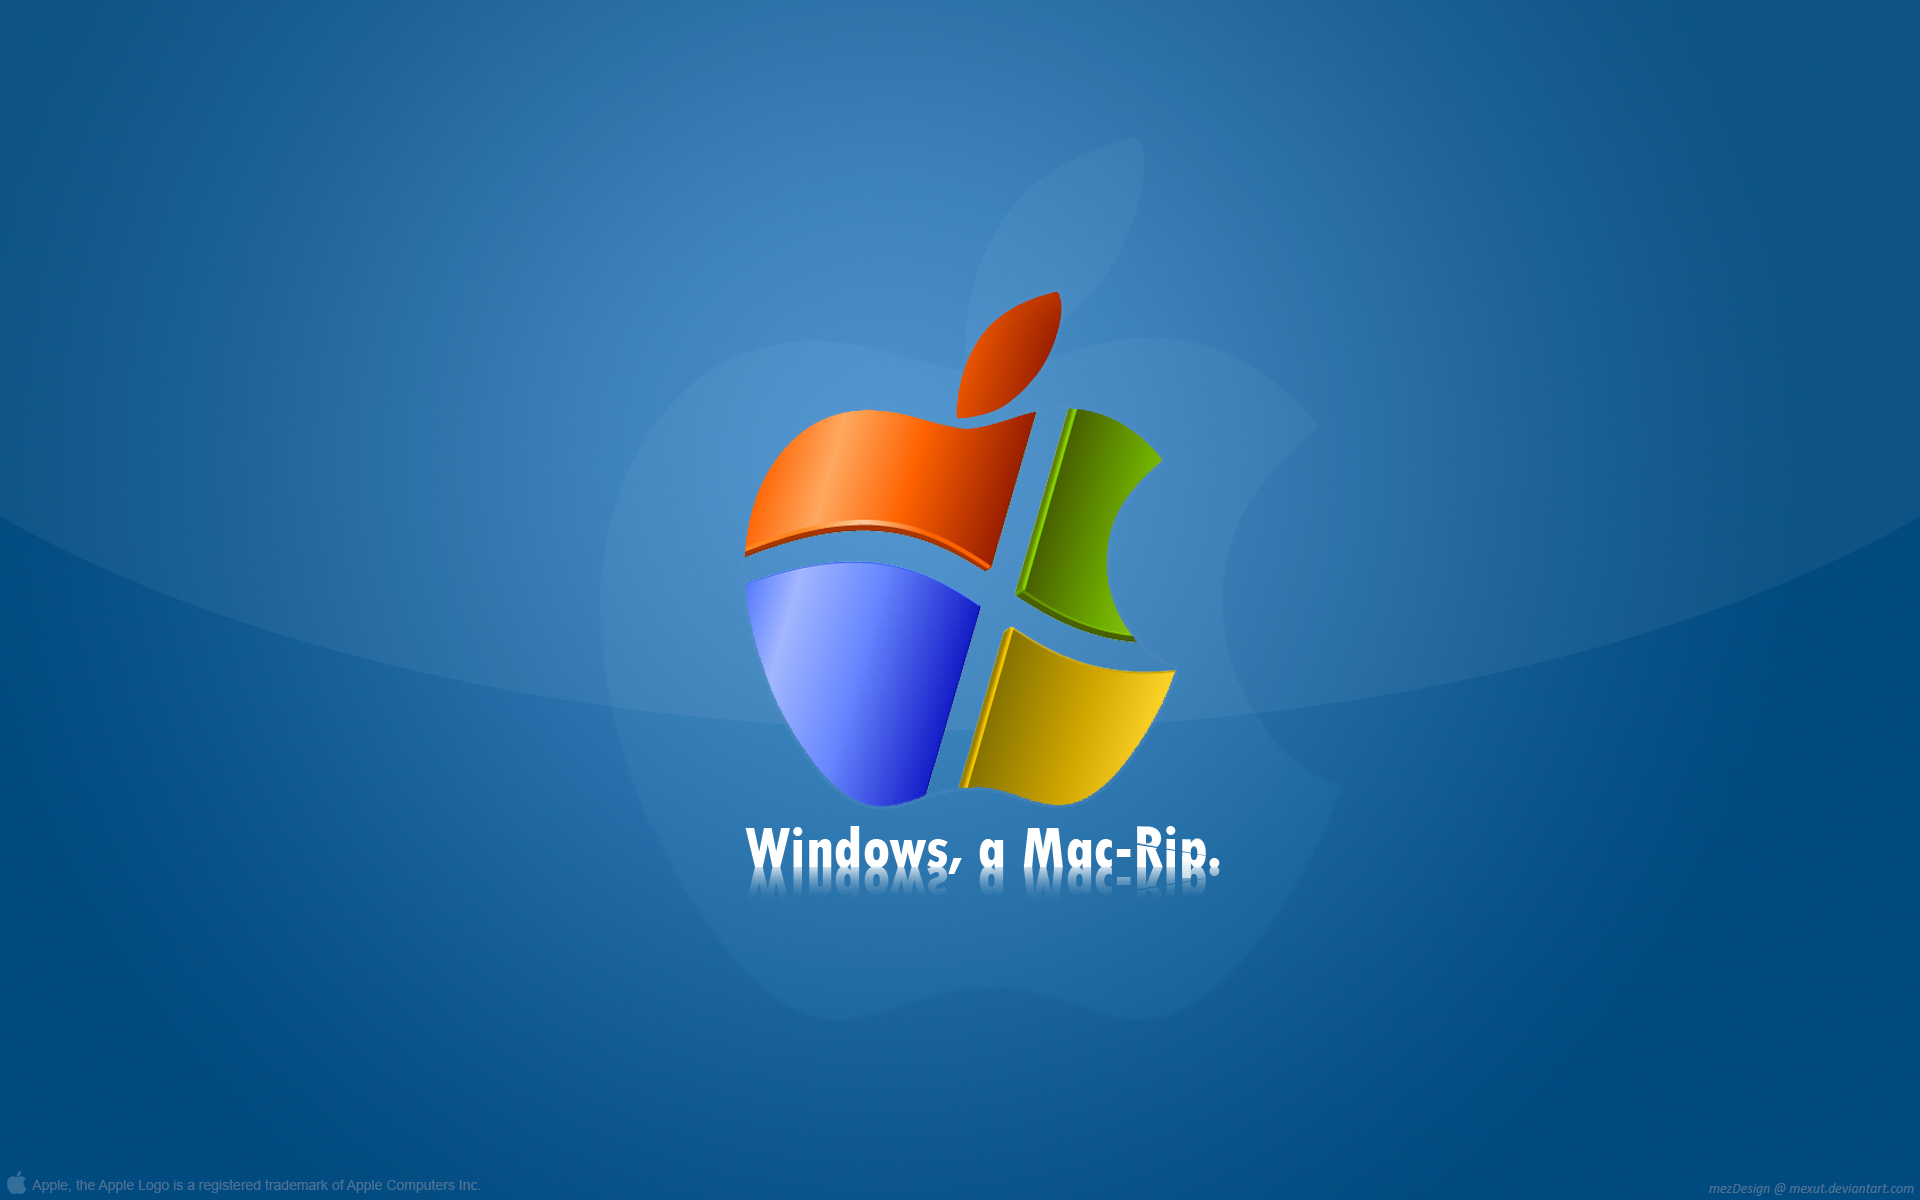 Windows - A Mac-Rip  by MeXuT on DeviantArt